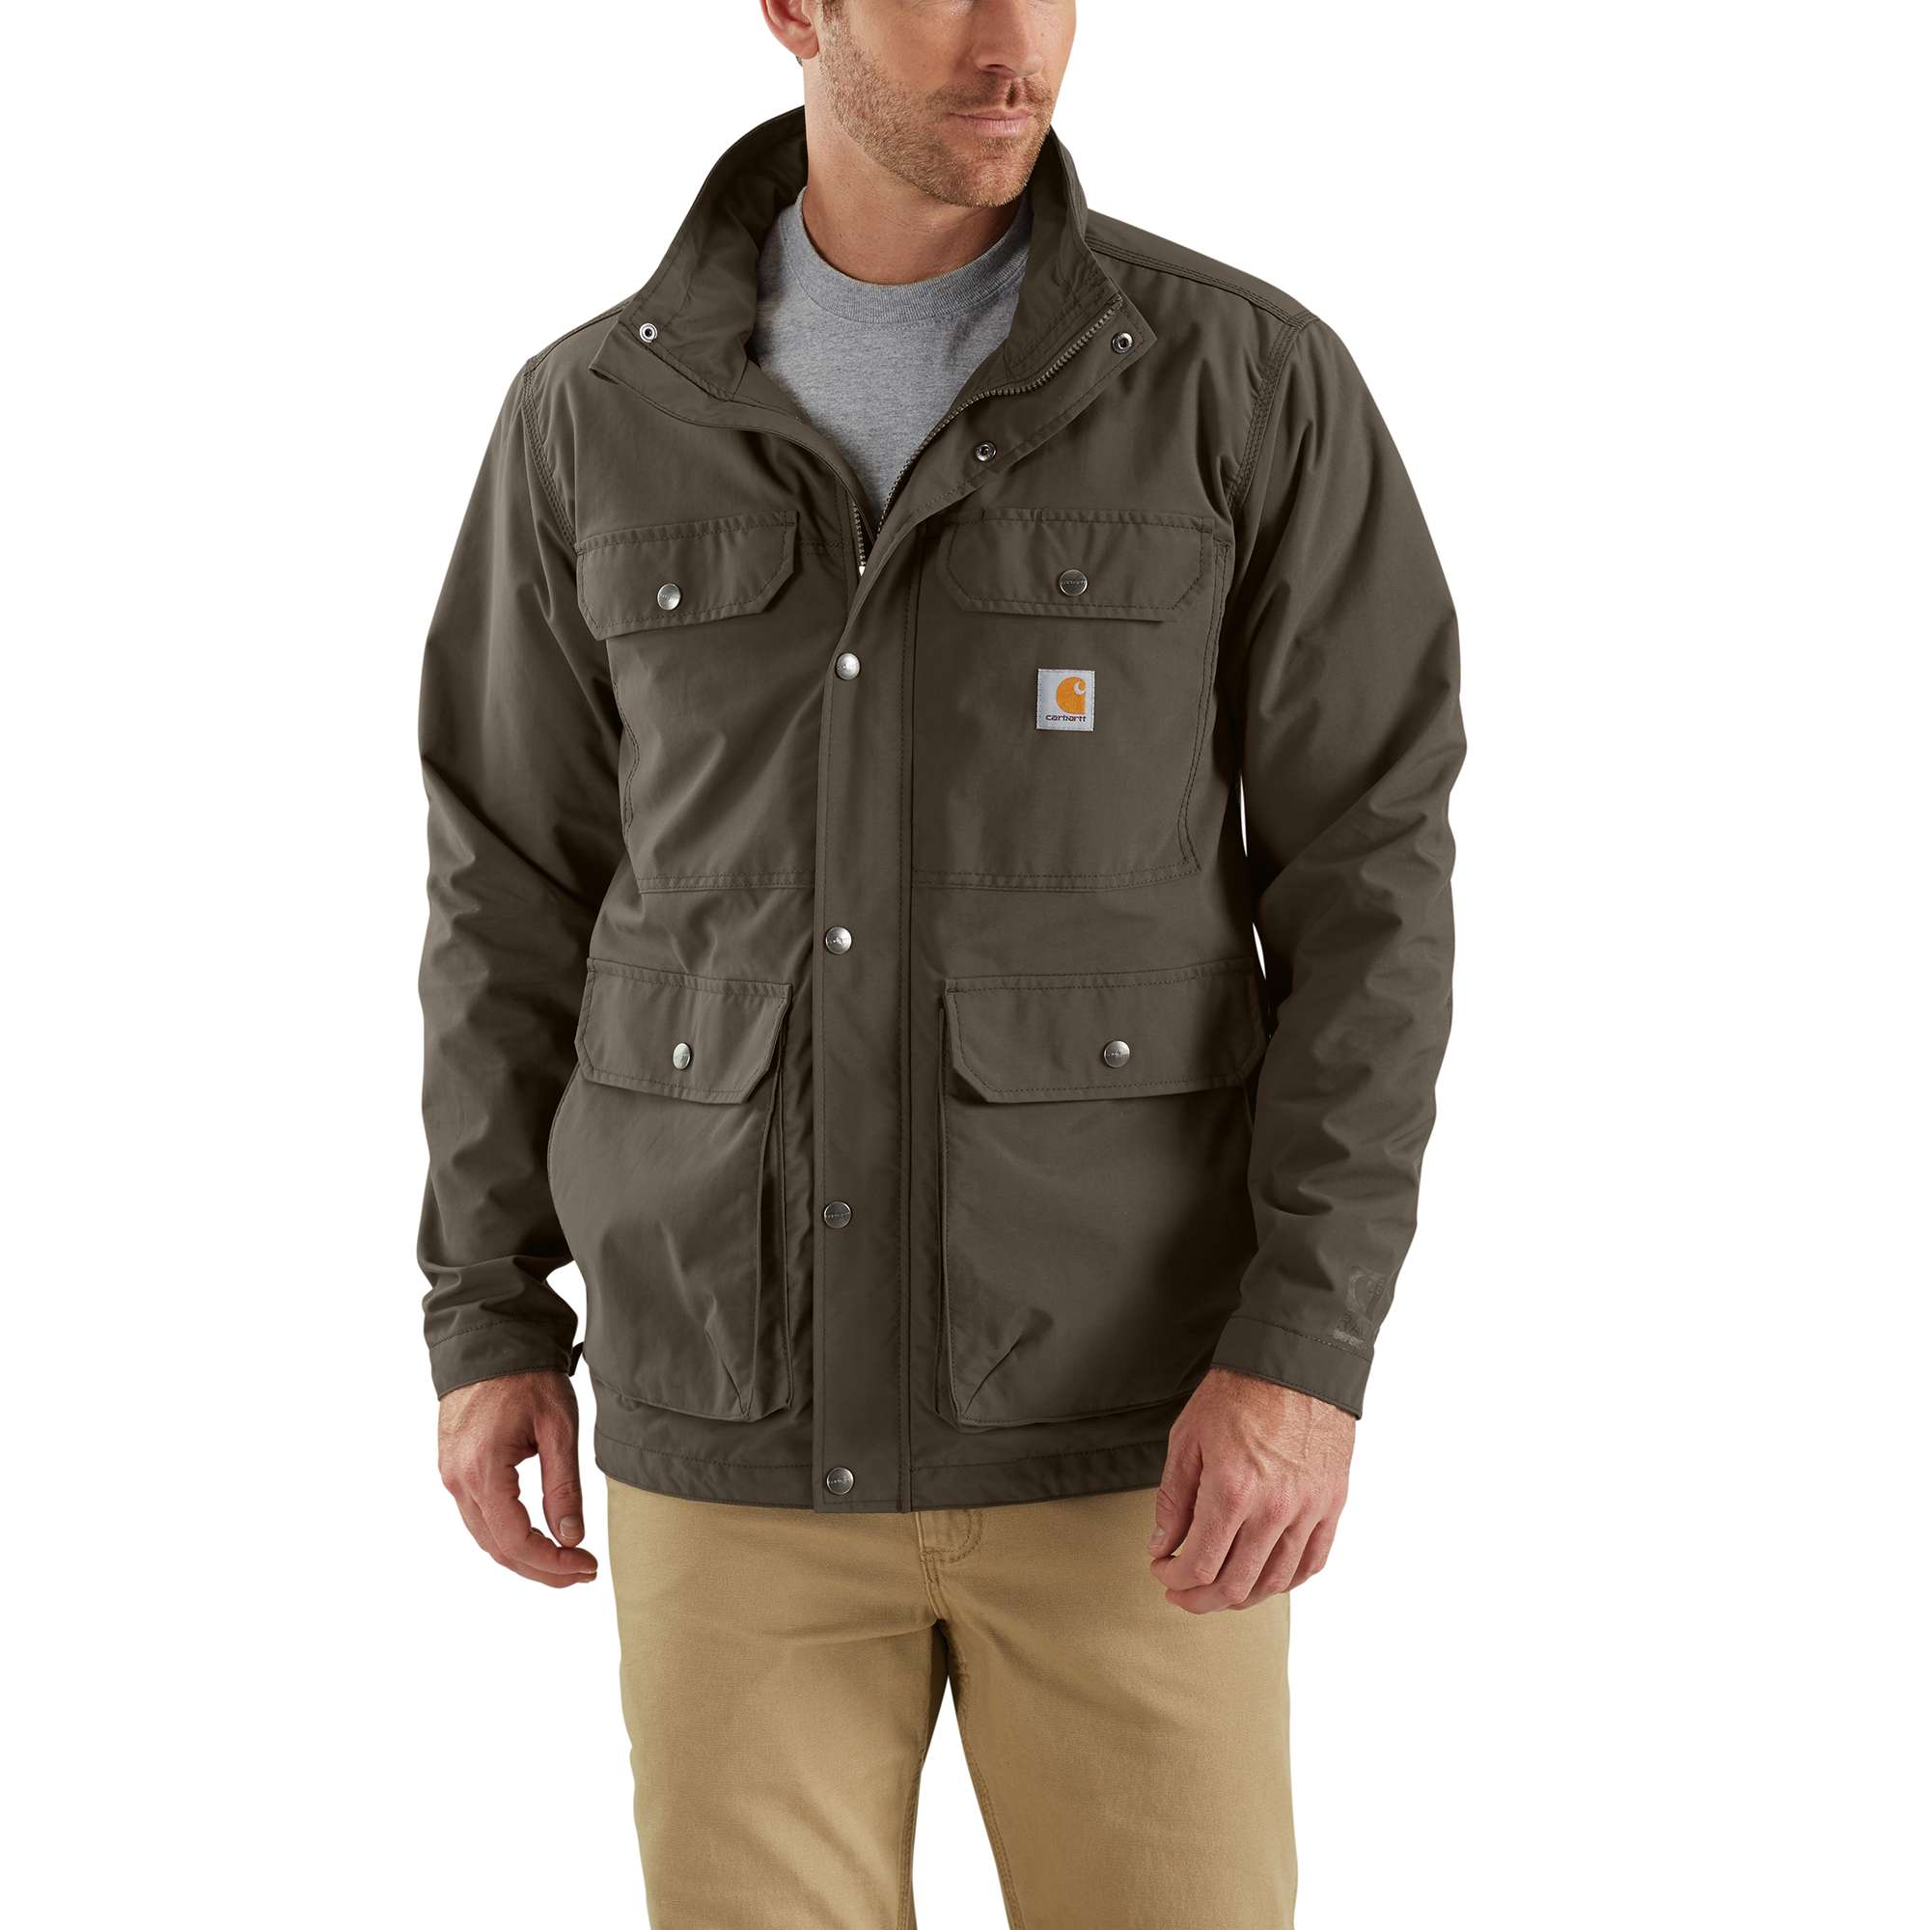 Carhartt Utility Coat